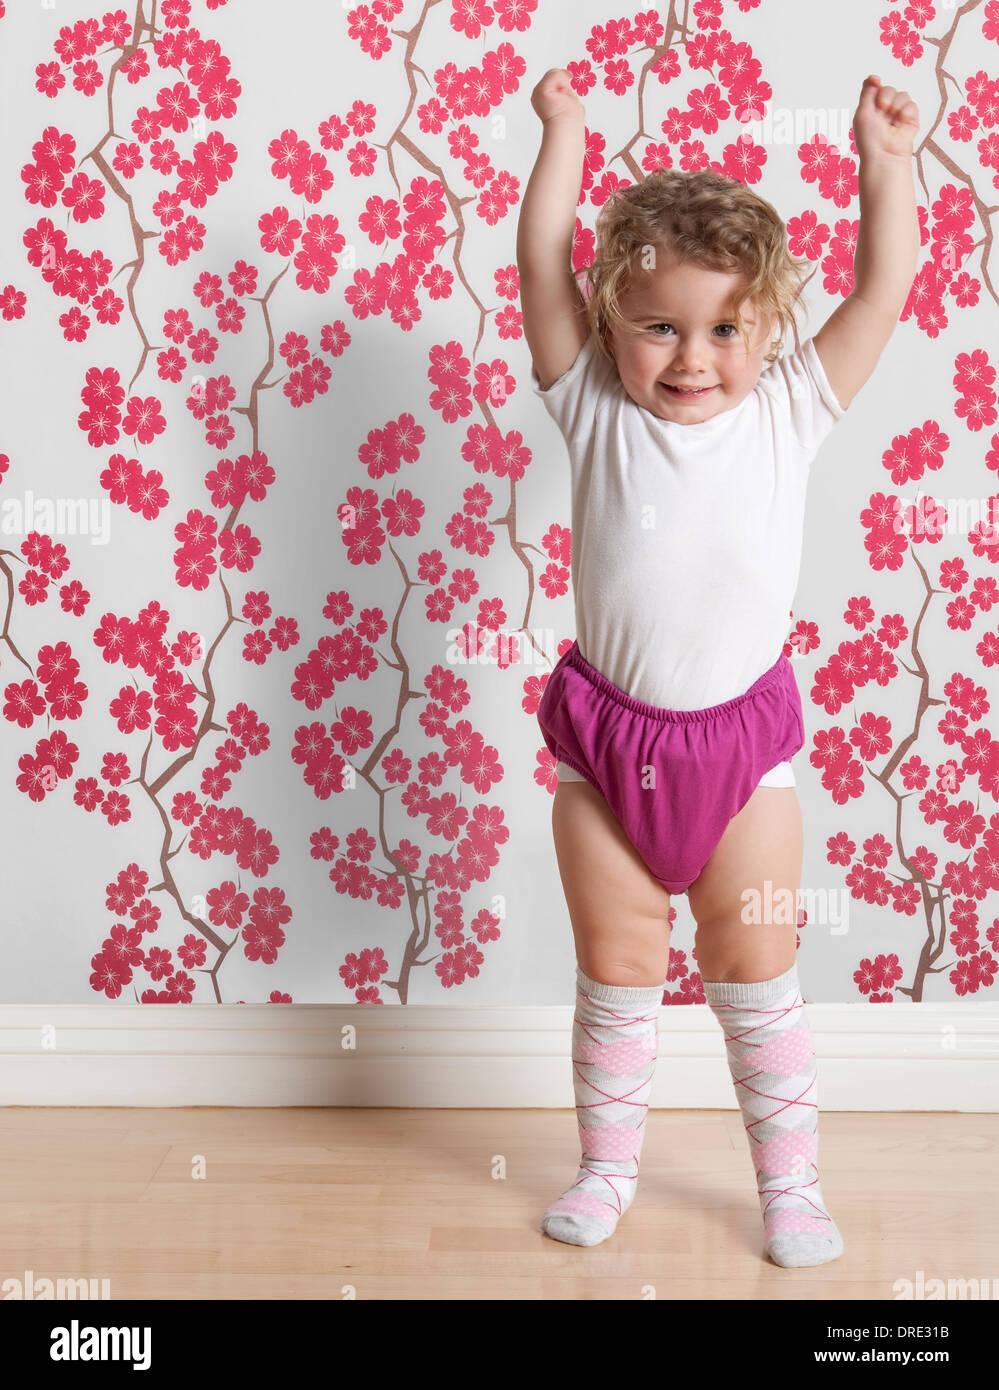 Kleinkind vor bunten Tapeten Stockbild